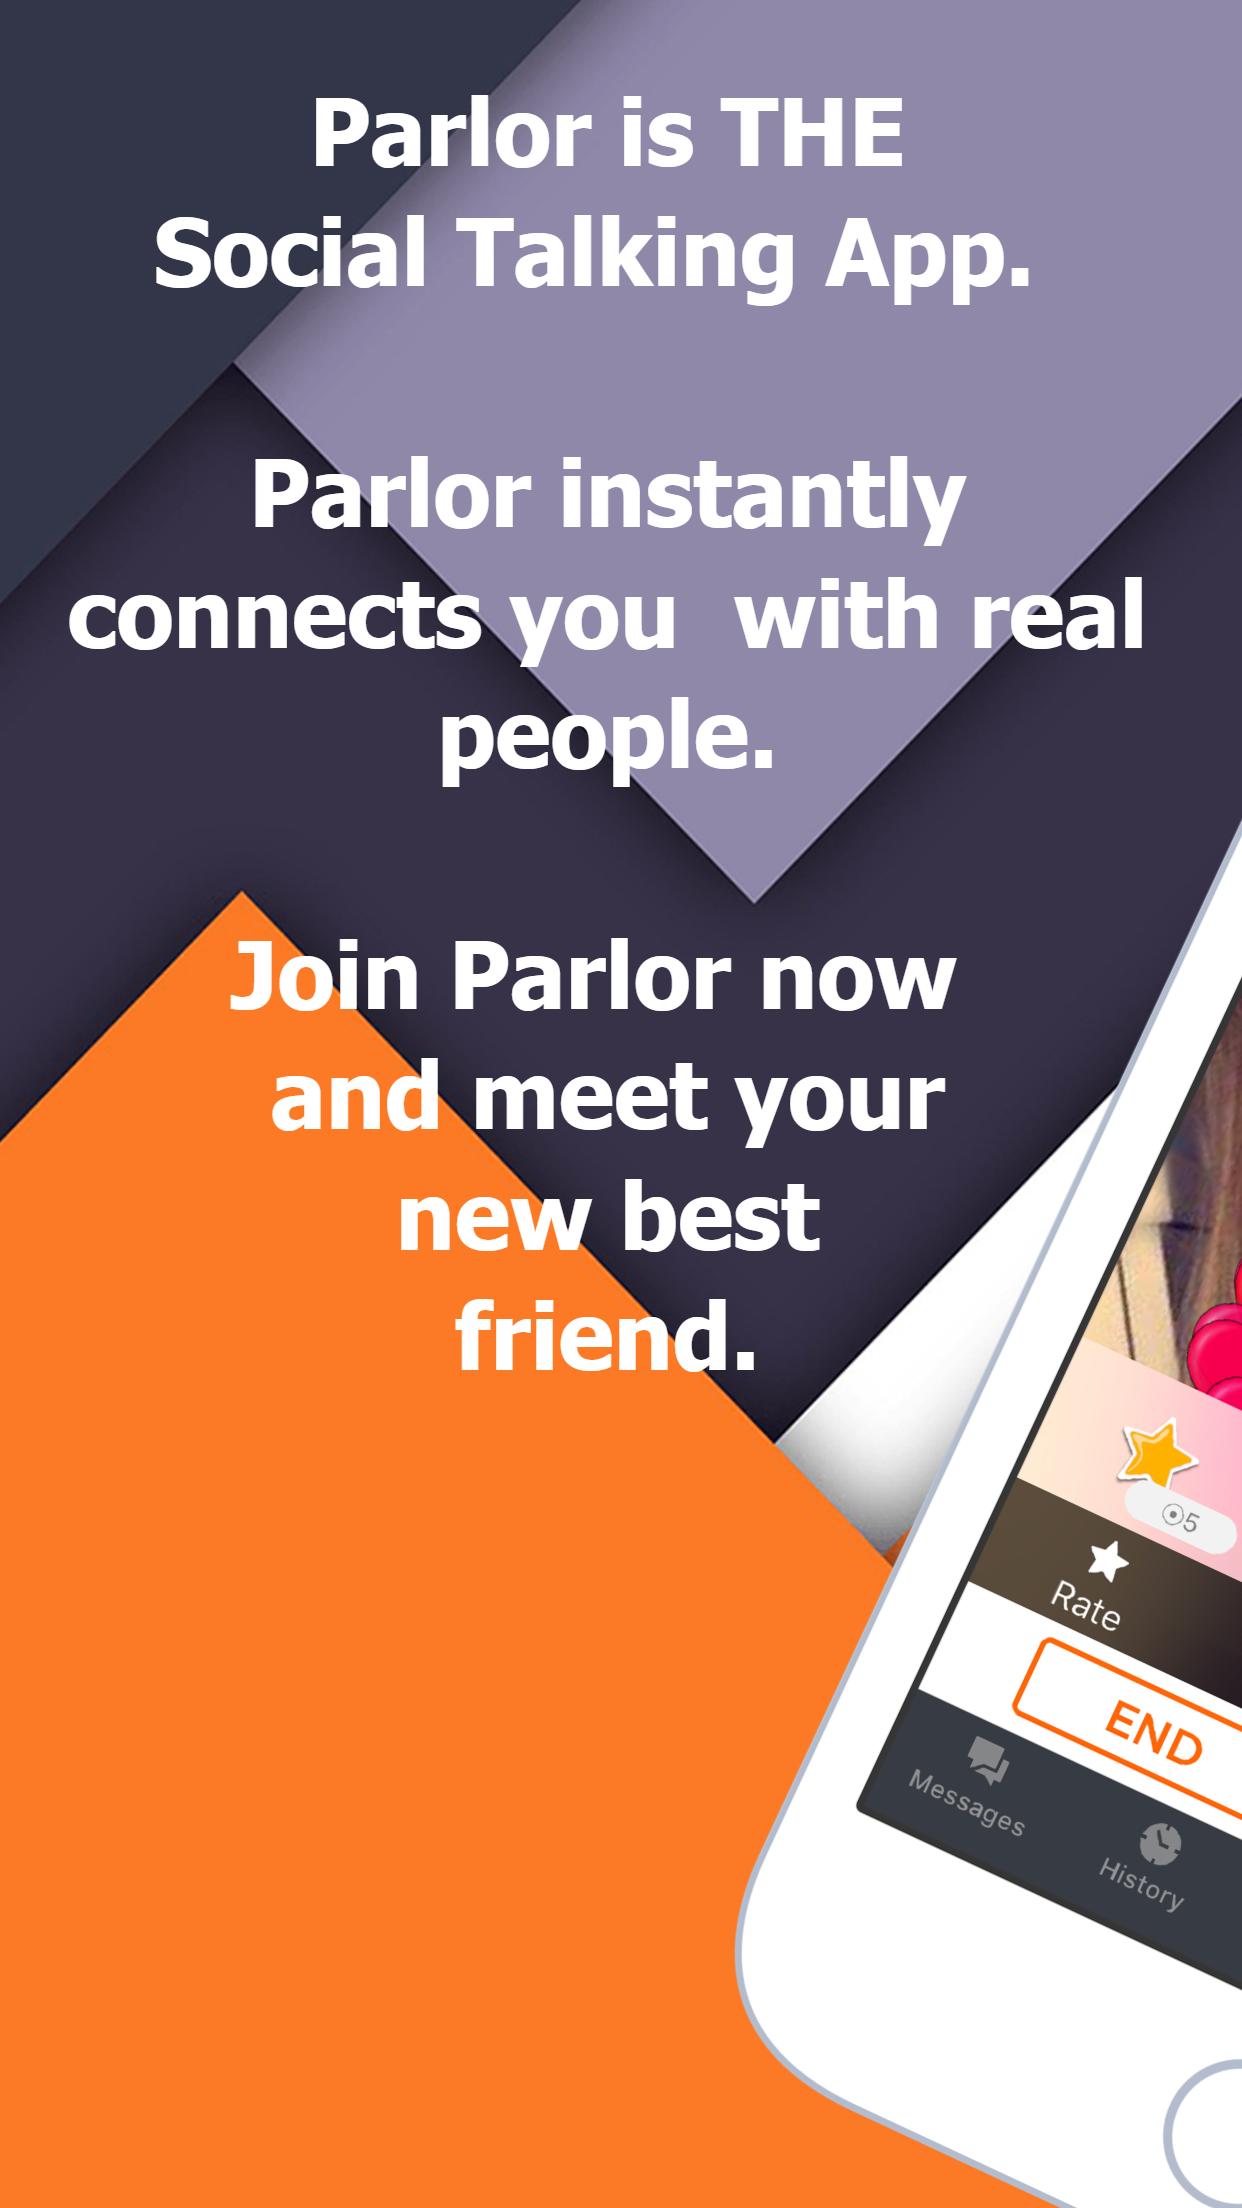 Parlor: The Social Talking App Screenshot